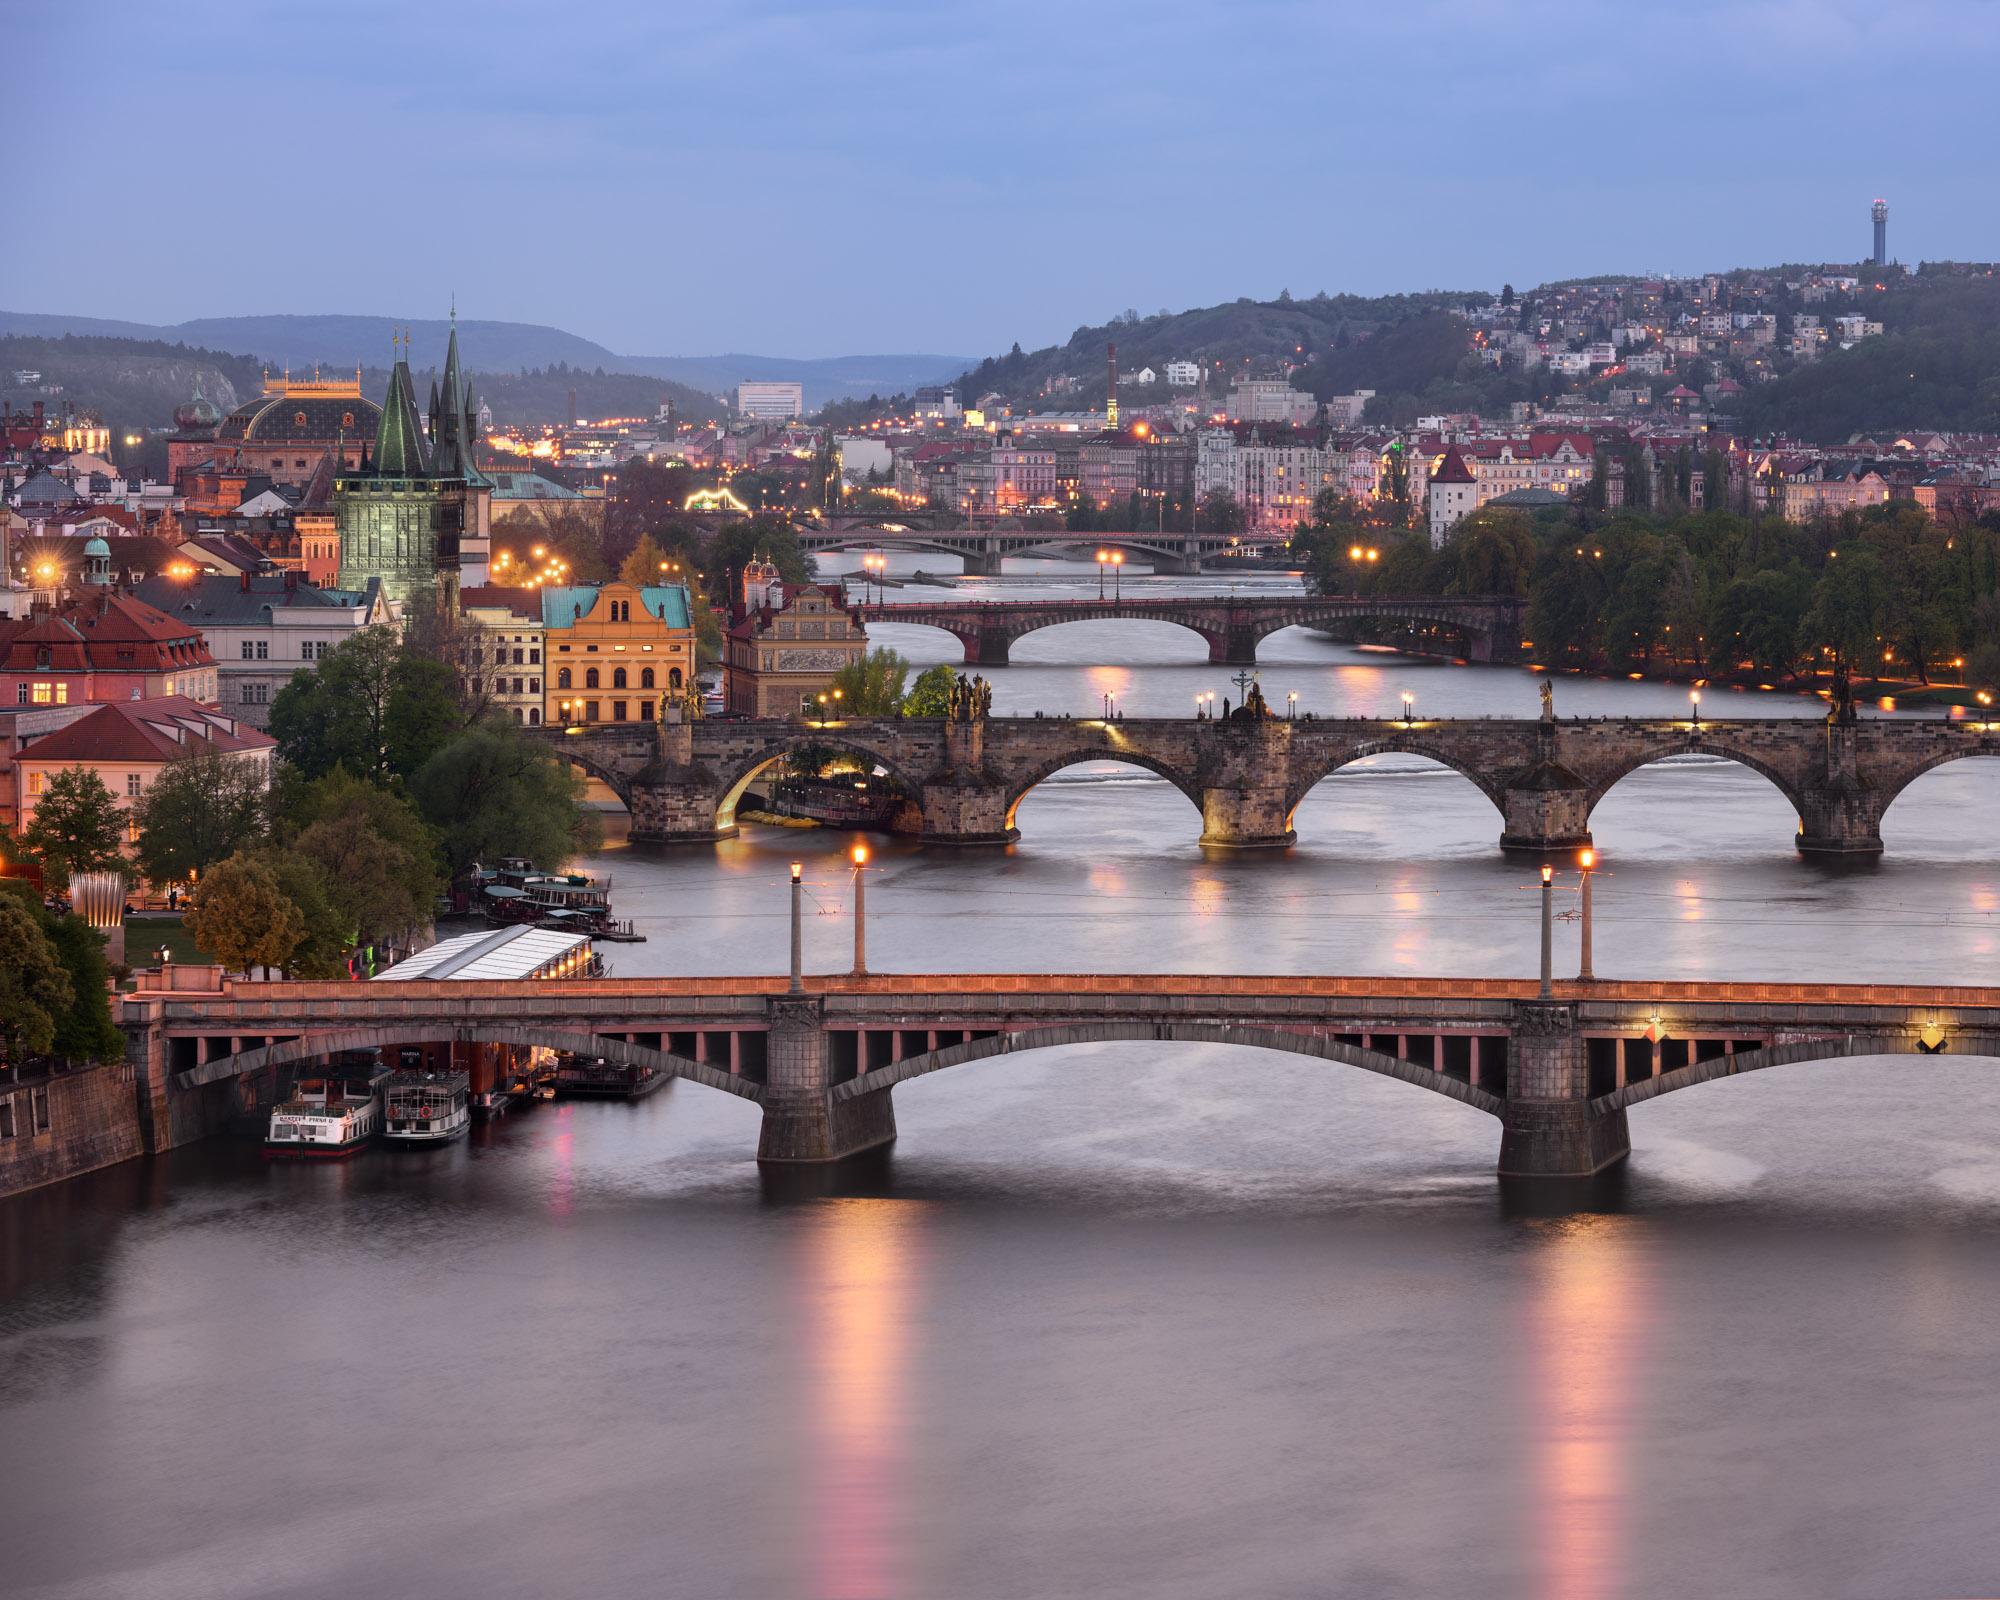 Aerial View of Vltava River and its Bridges, Prague